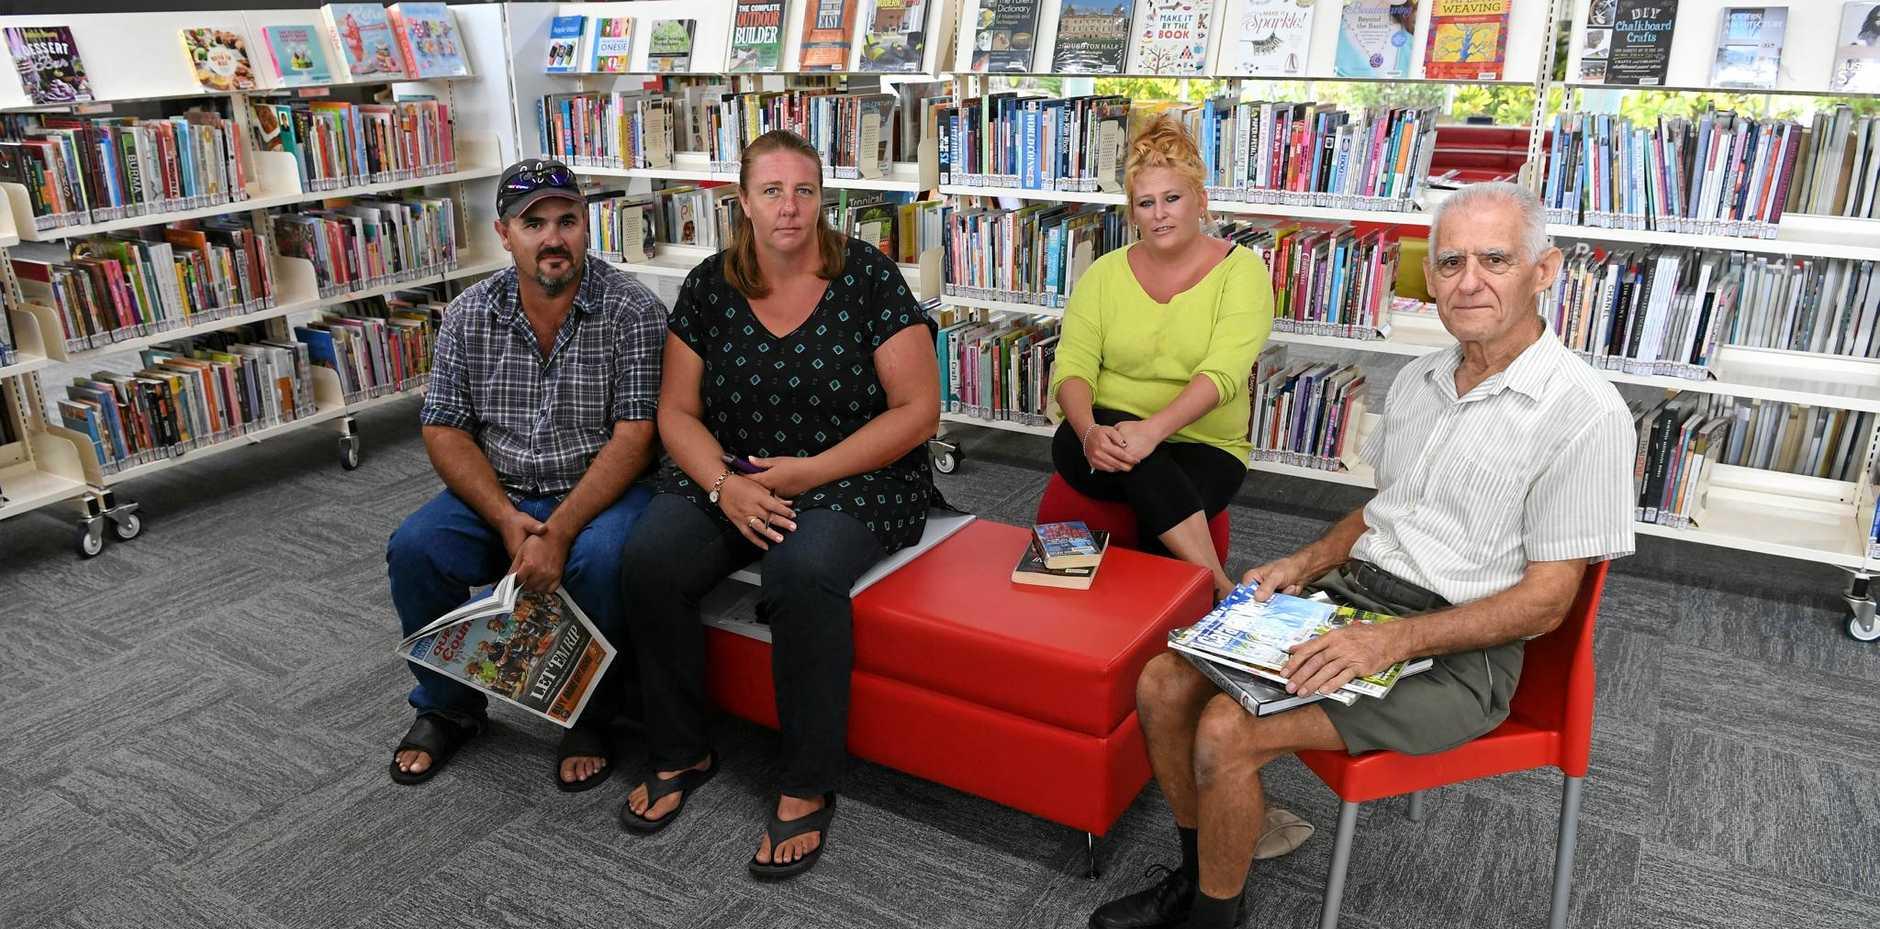 AT THE LIBRARY: Dwayne Makings, Patricia Makings, Linda Ryder and Jim Round.